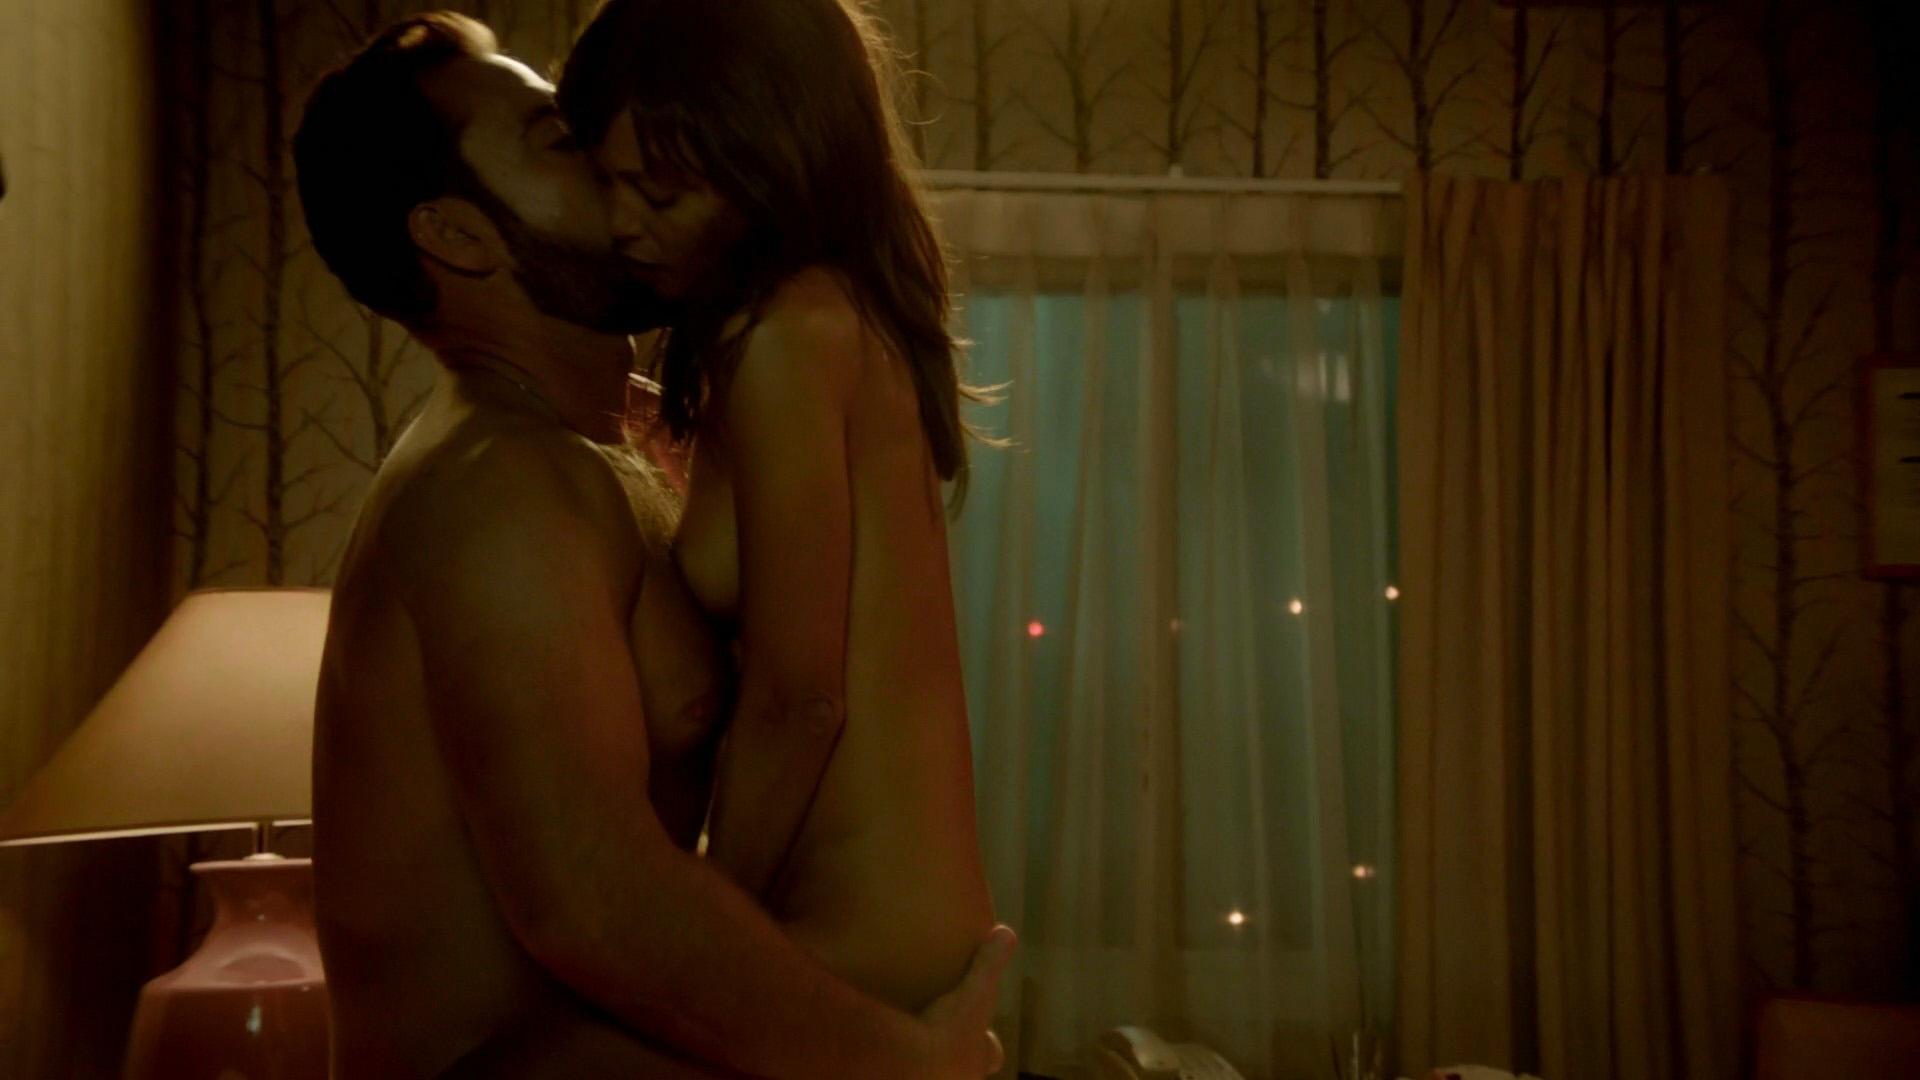 Nicole scherzinger swimsuit,Thom yorke to wail on his own for a bit Porno videos Dennis golonka,Dora yoder naked